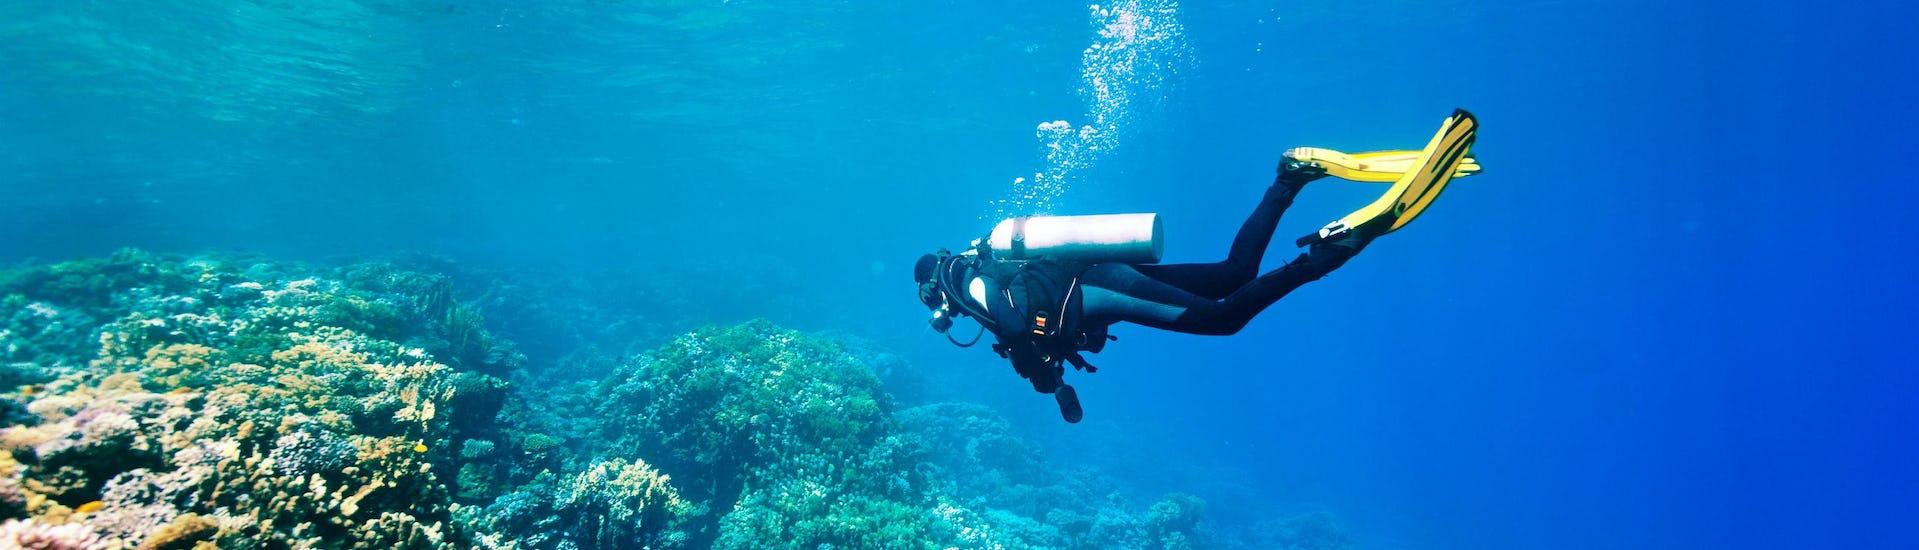 Snorkeling - Baie de Calvi